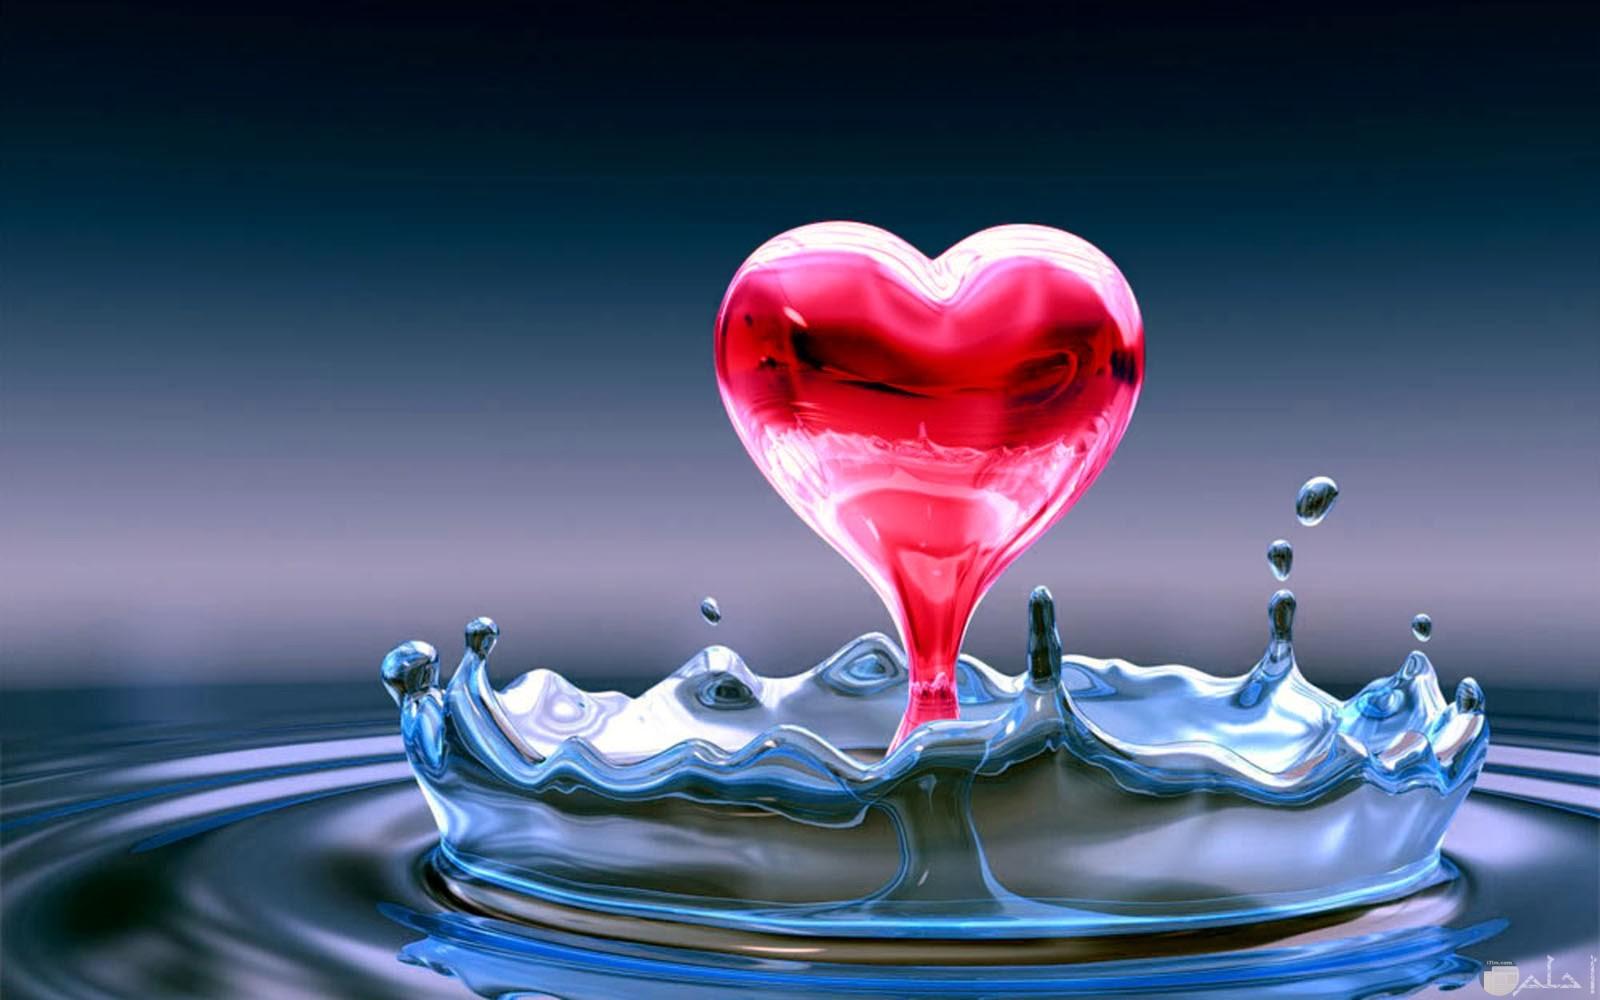 خلفيات قلوب حمرا